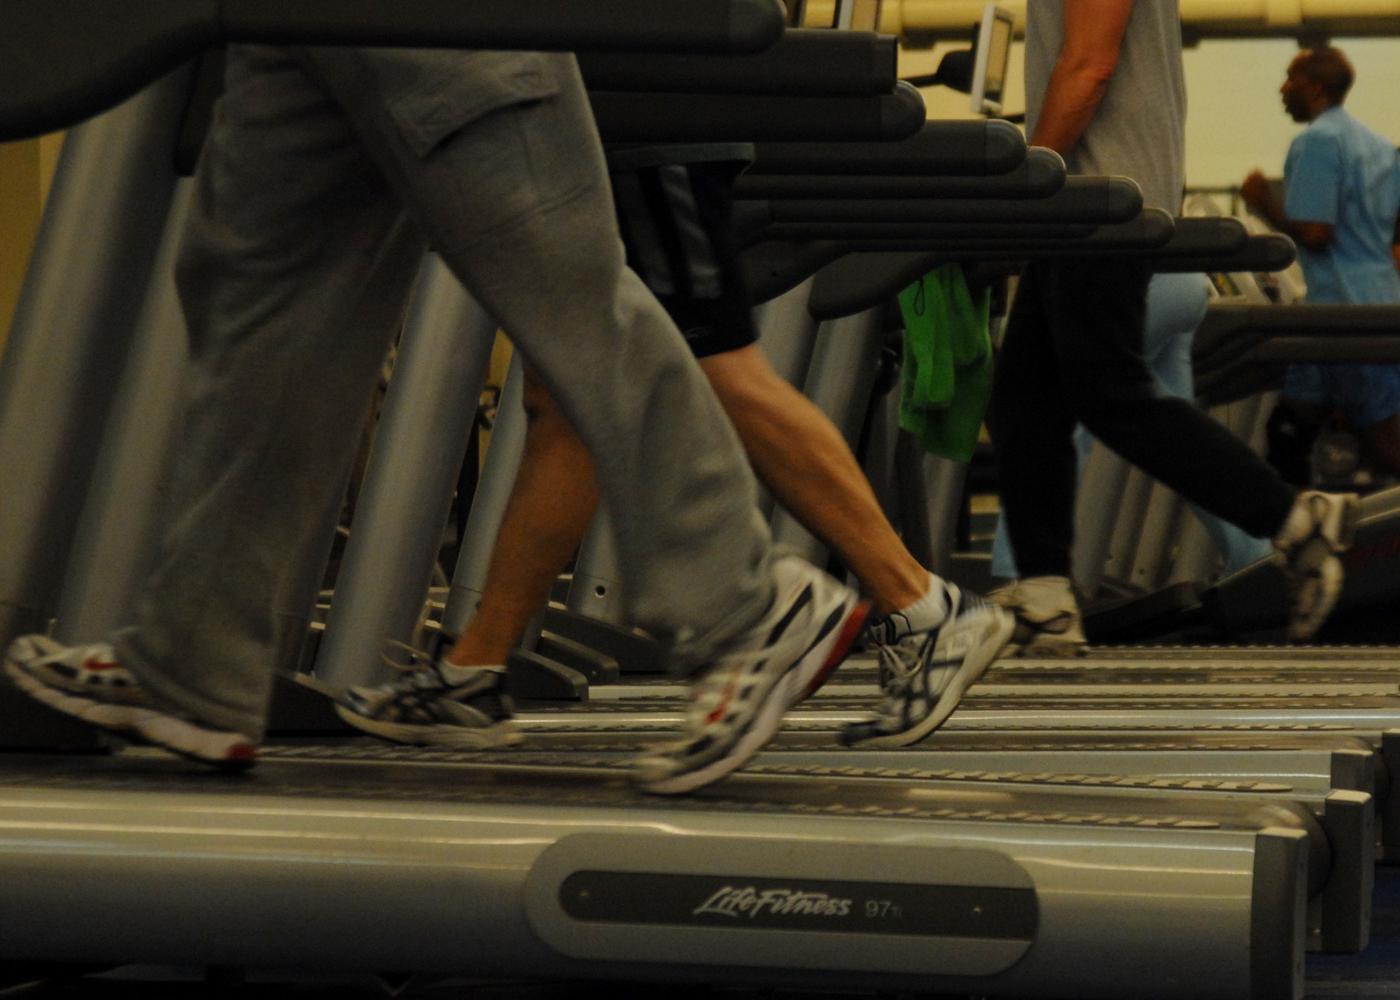 treadmill, exercise